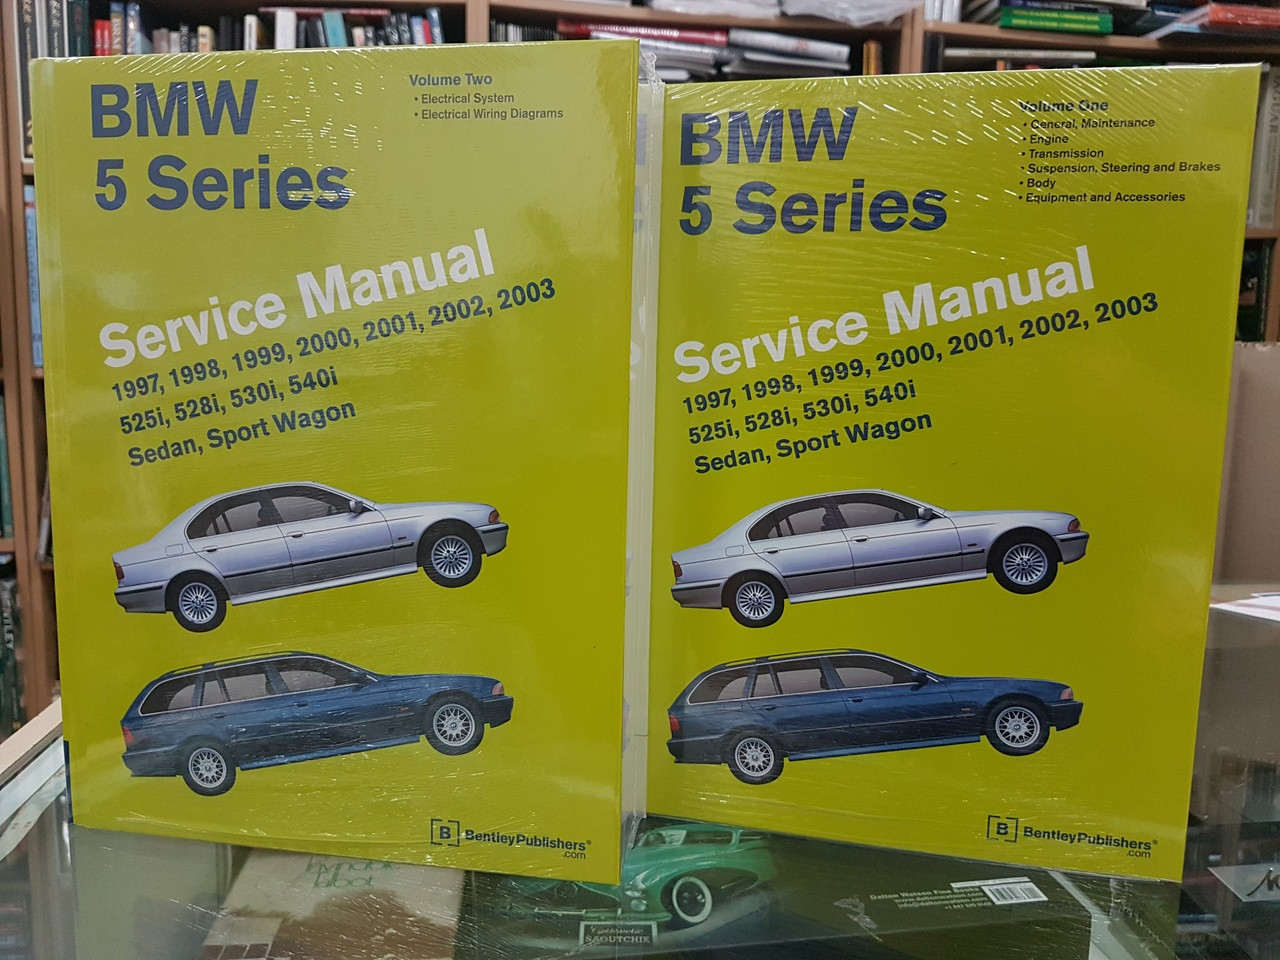 Bmw 5 Series E39 1997 2003 Workshop Manual 1994 525i Wiring Diagram 528i 530i 540i